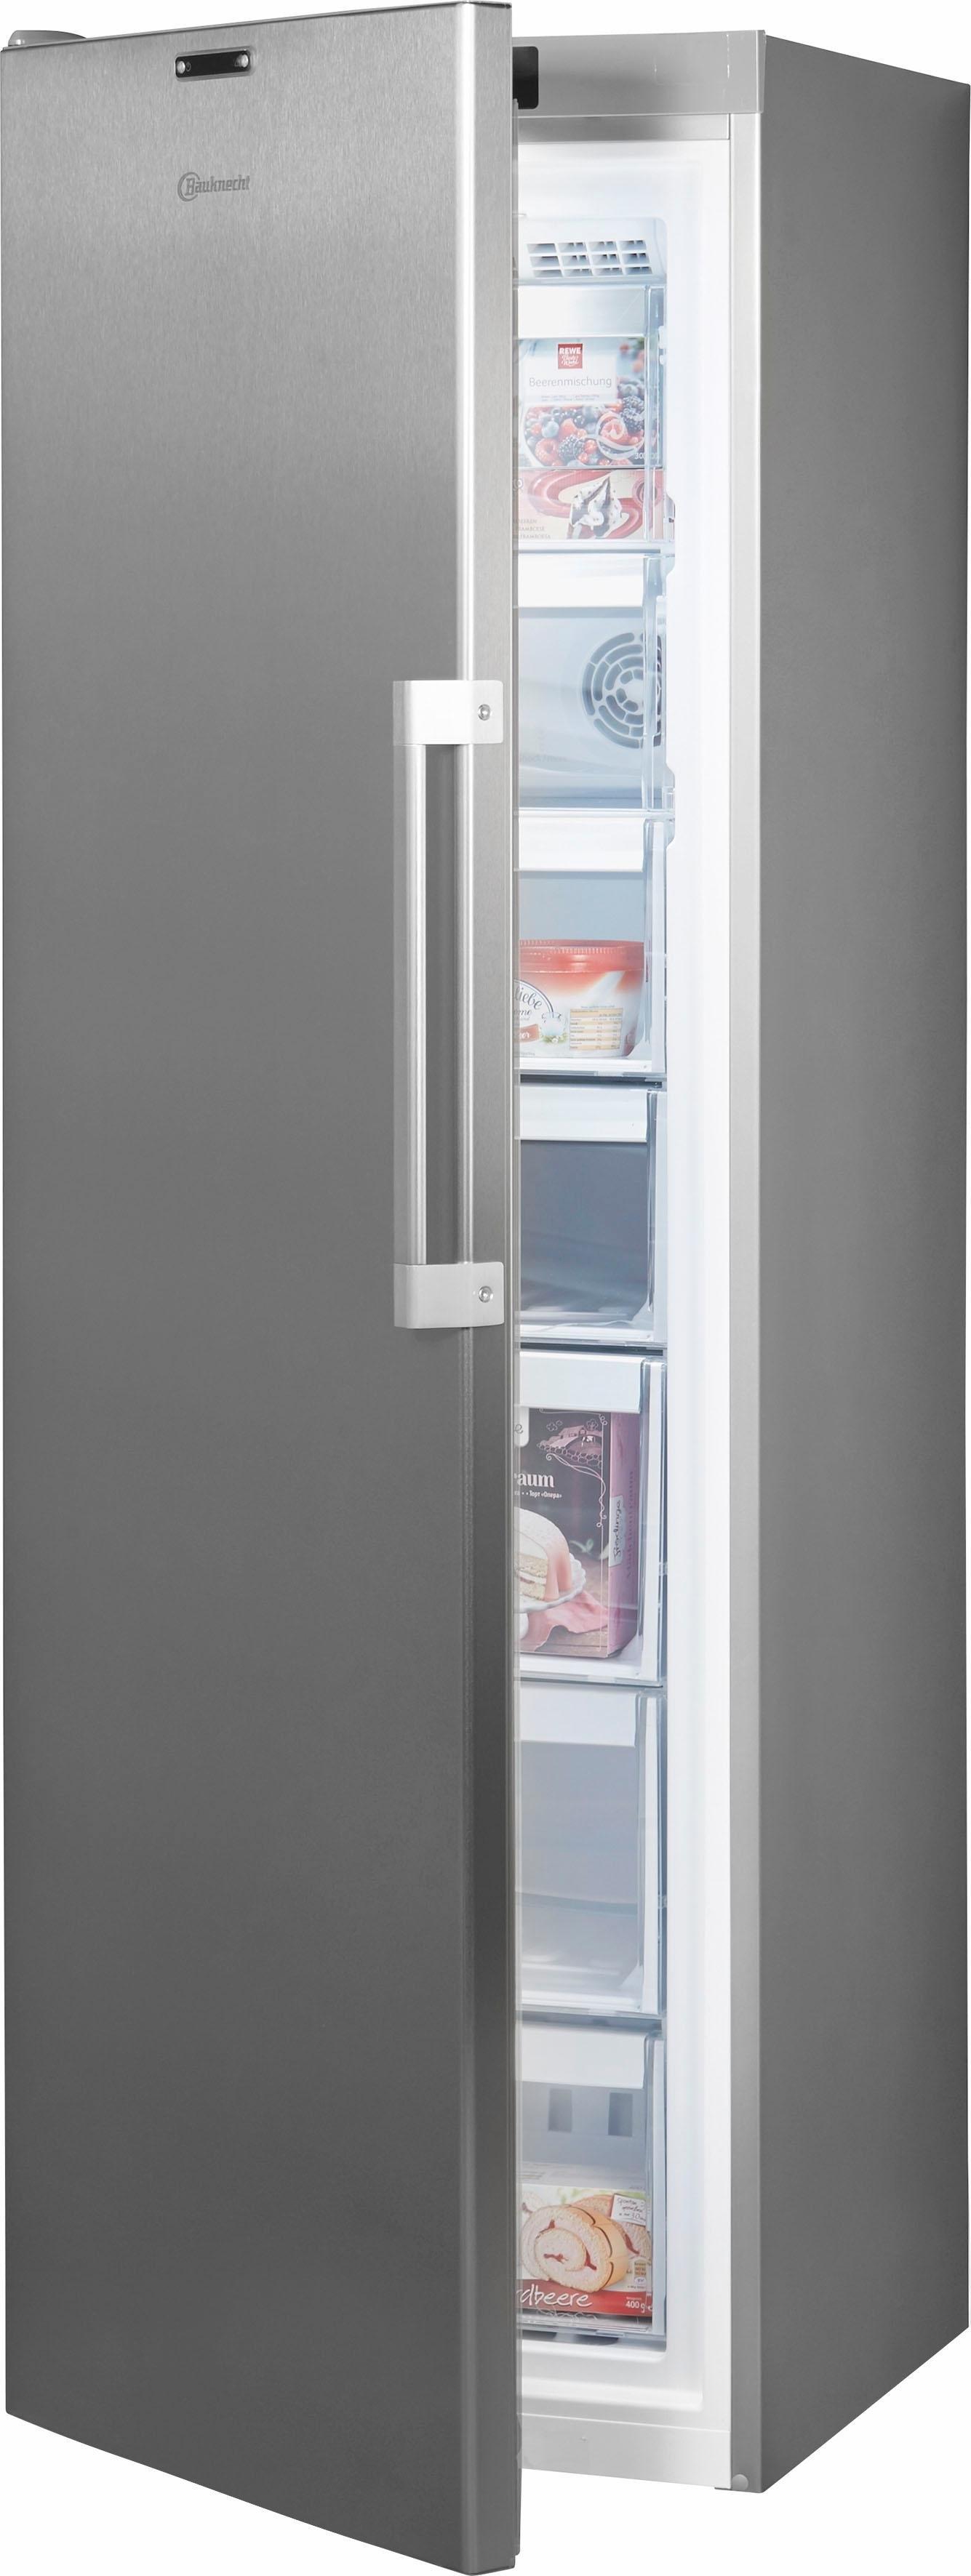 BAUKNECHT vrieskast GKN19 G4SA2+ IN, A++, 187,5 cm hoog, No Frost nu online bestellen